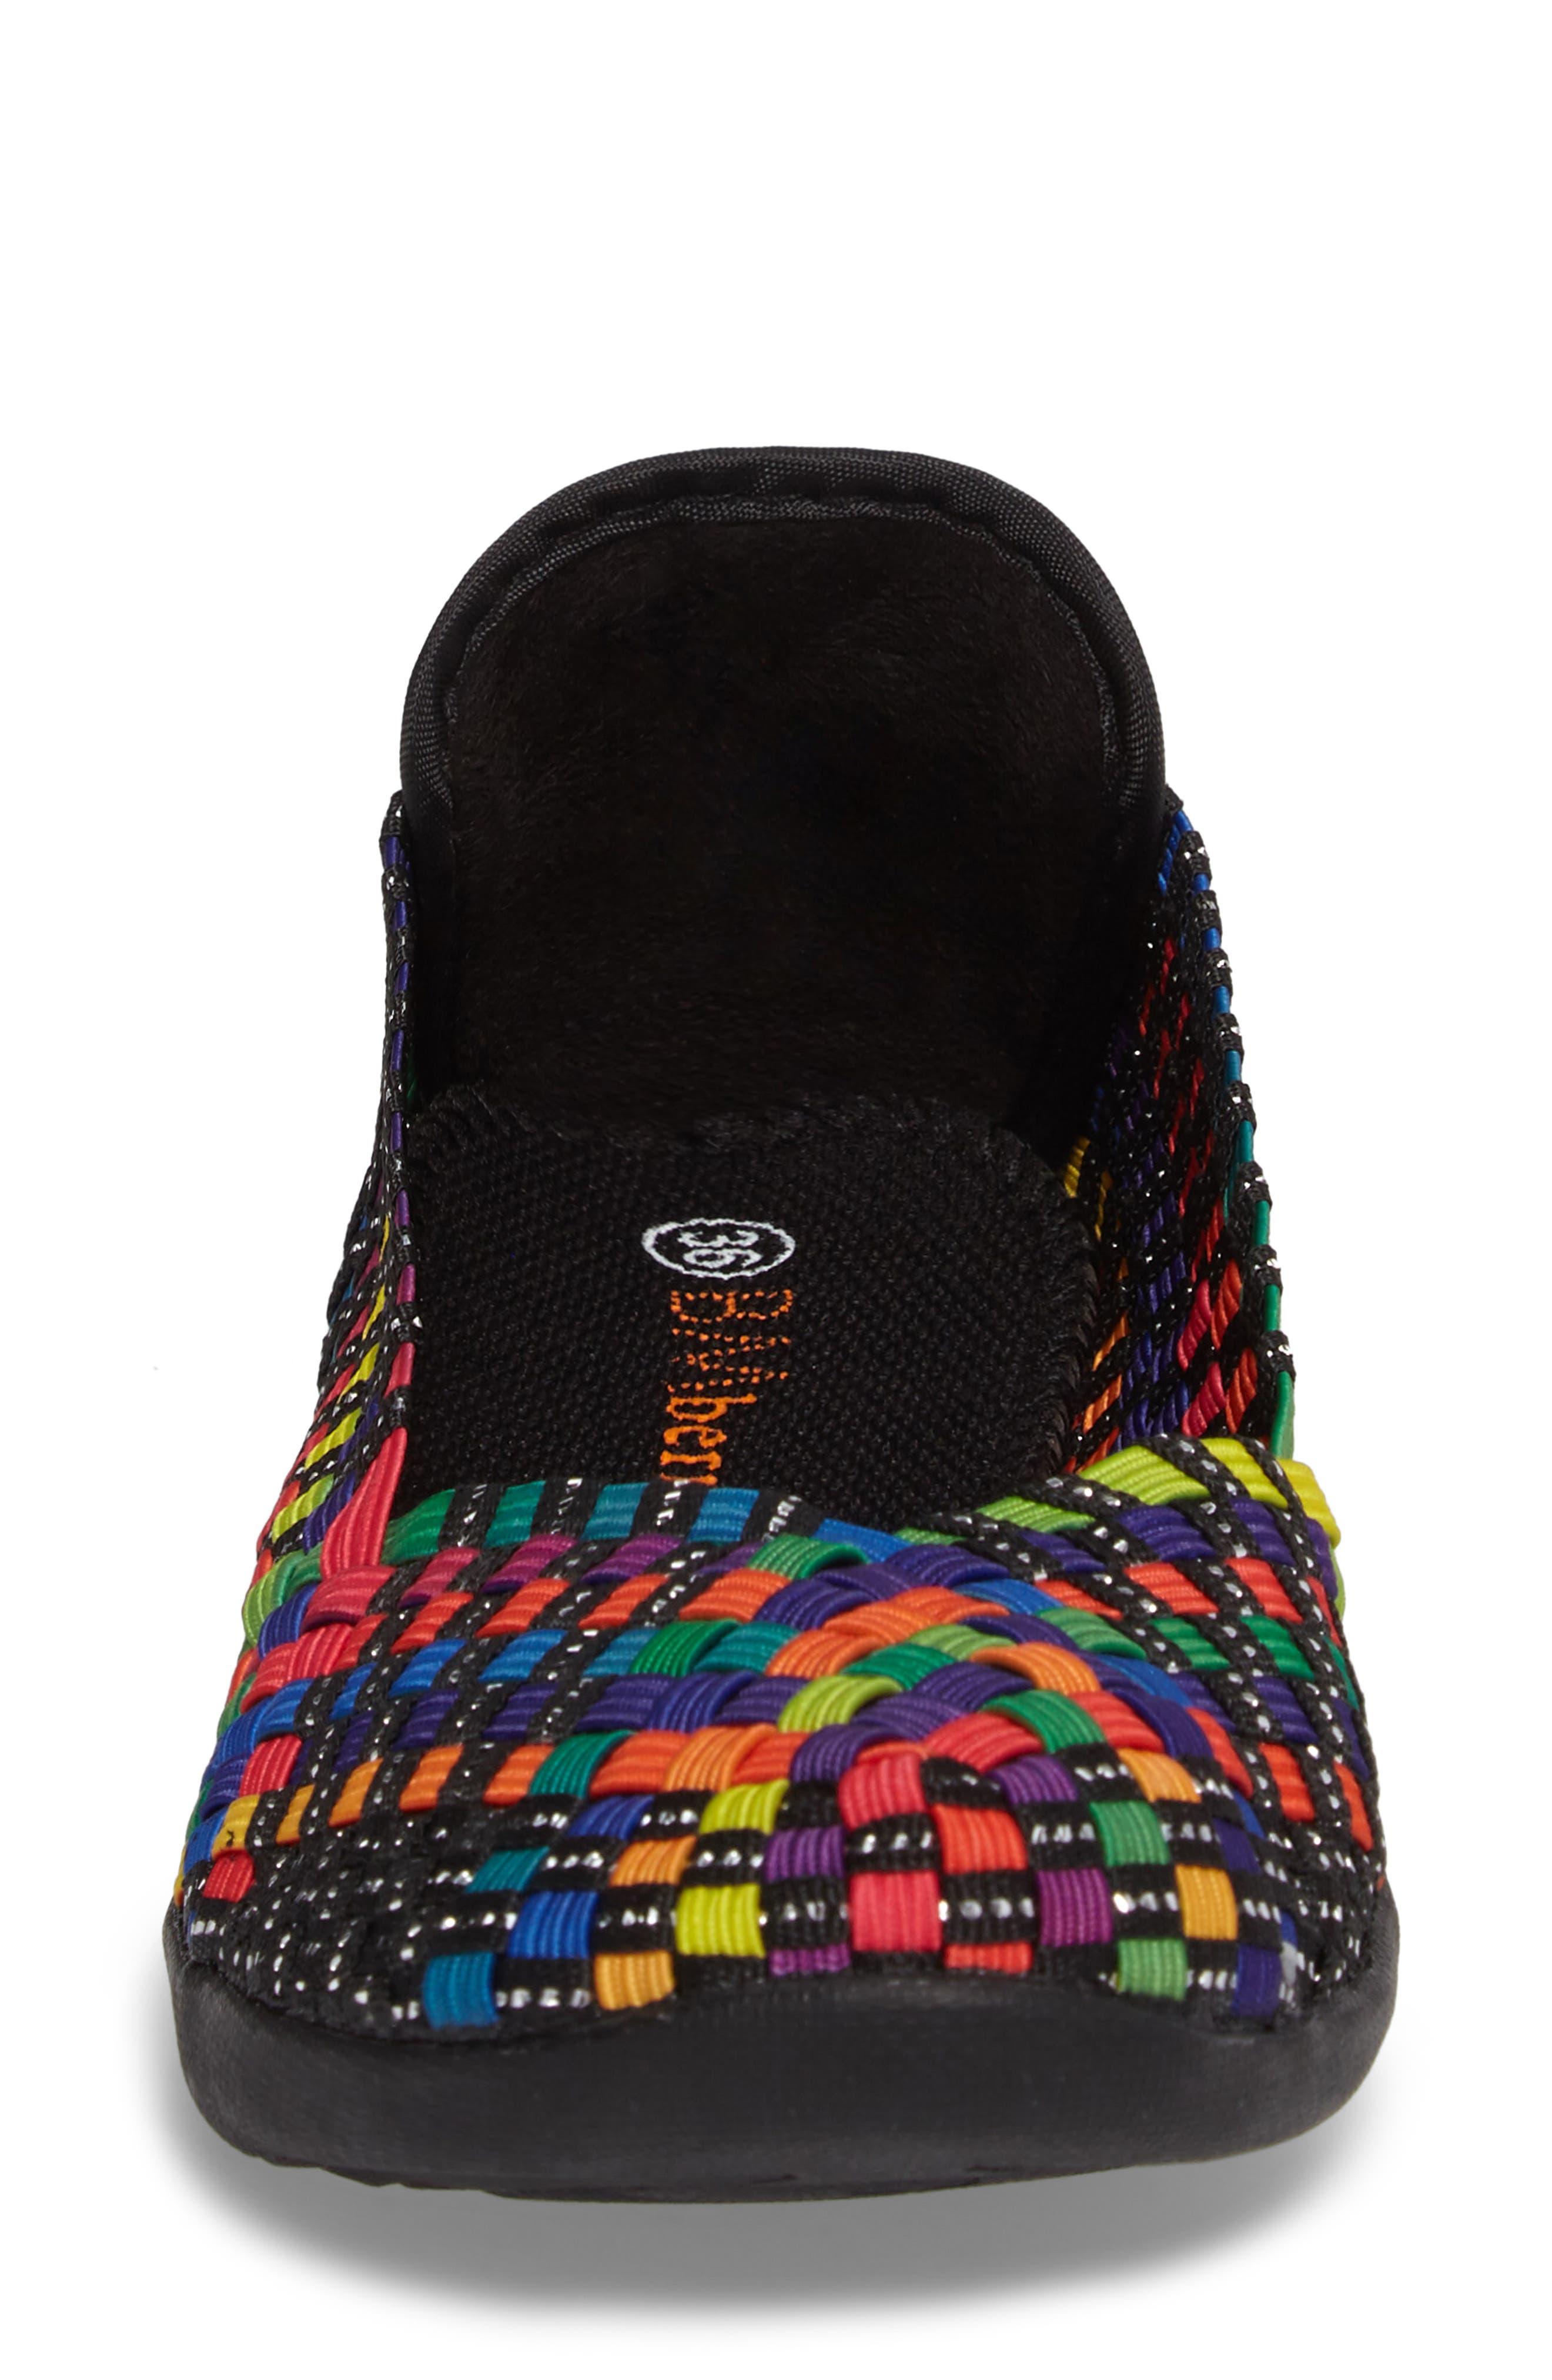 Catwalk Sneaker,                             Alternate thumbnail 4, color,                             Black Multi